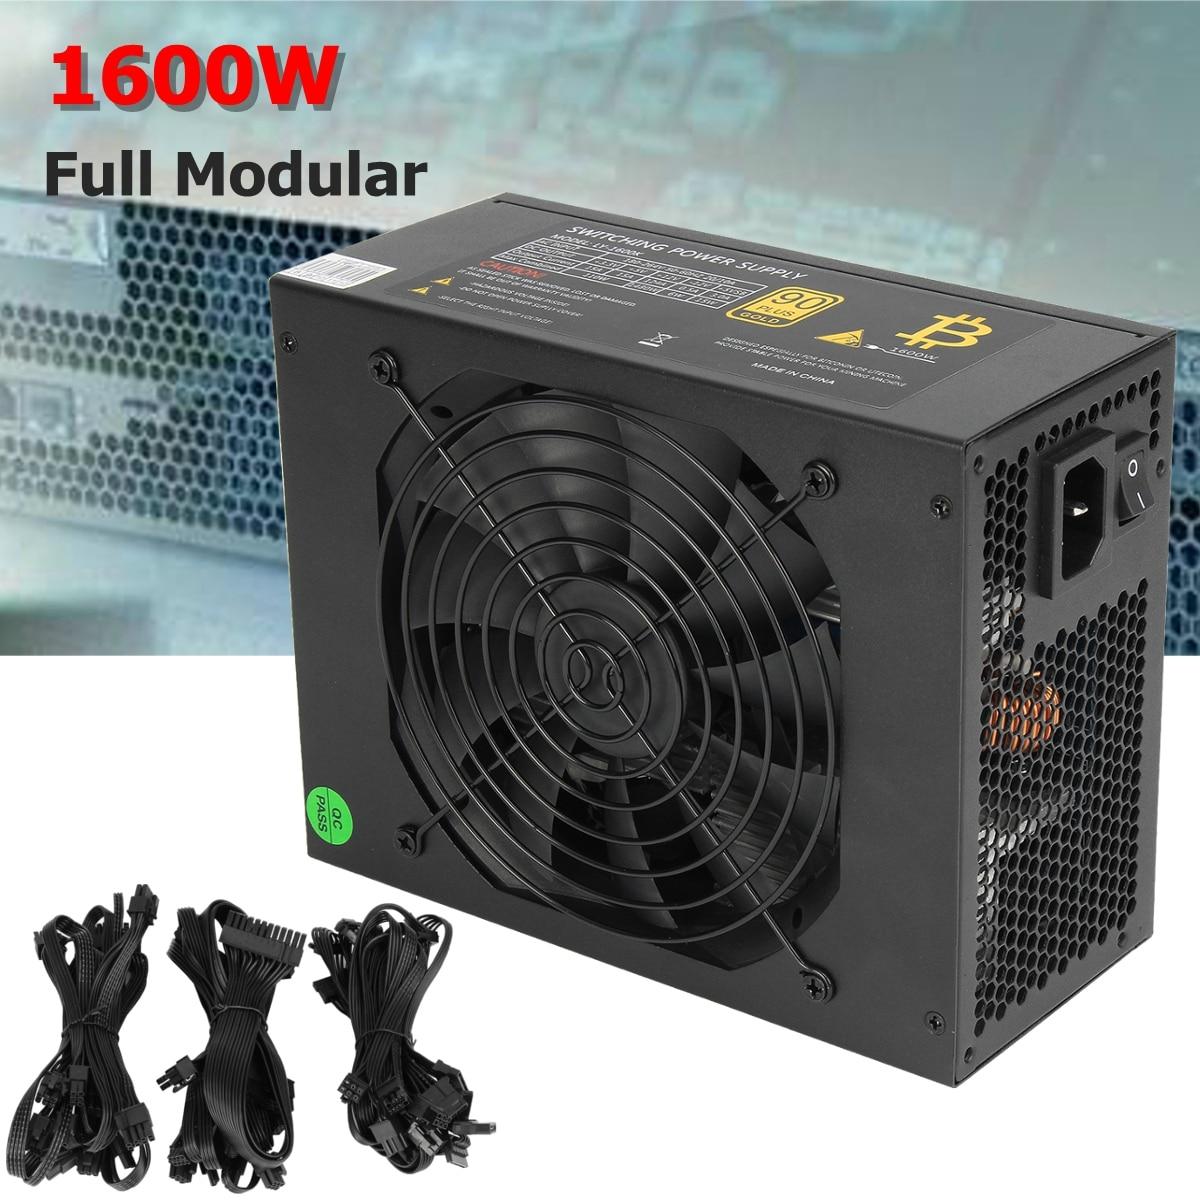 1600 w Modulare di Estrazione Mineraria di Alimentazione GPU Per Bitcoin Minatore Eth Rig S7 S9 L3 + D3 computer di Alta Qualità di Alimentazione Per BTC